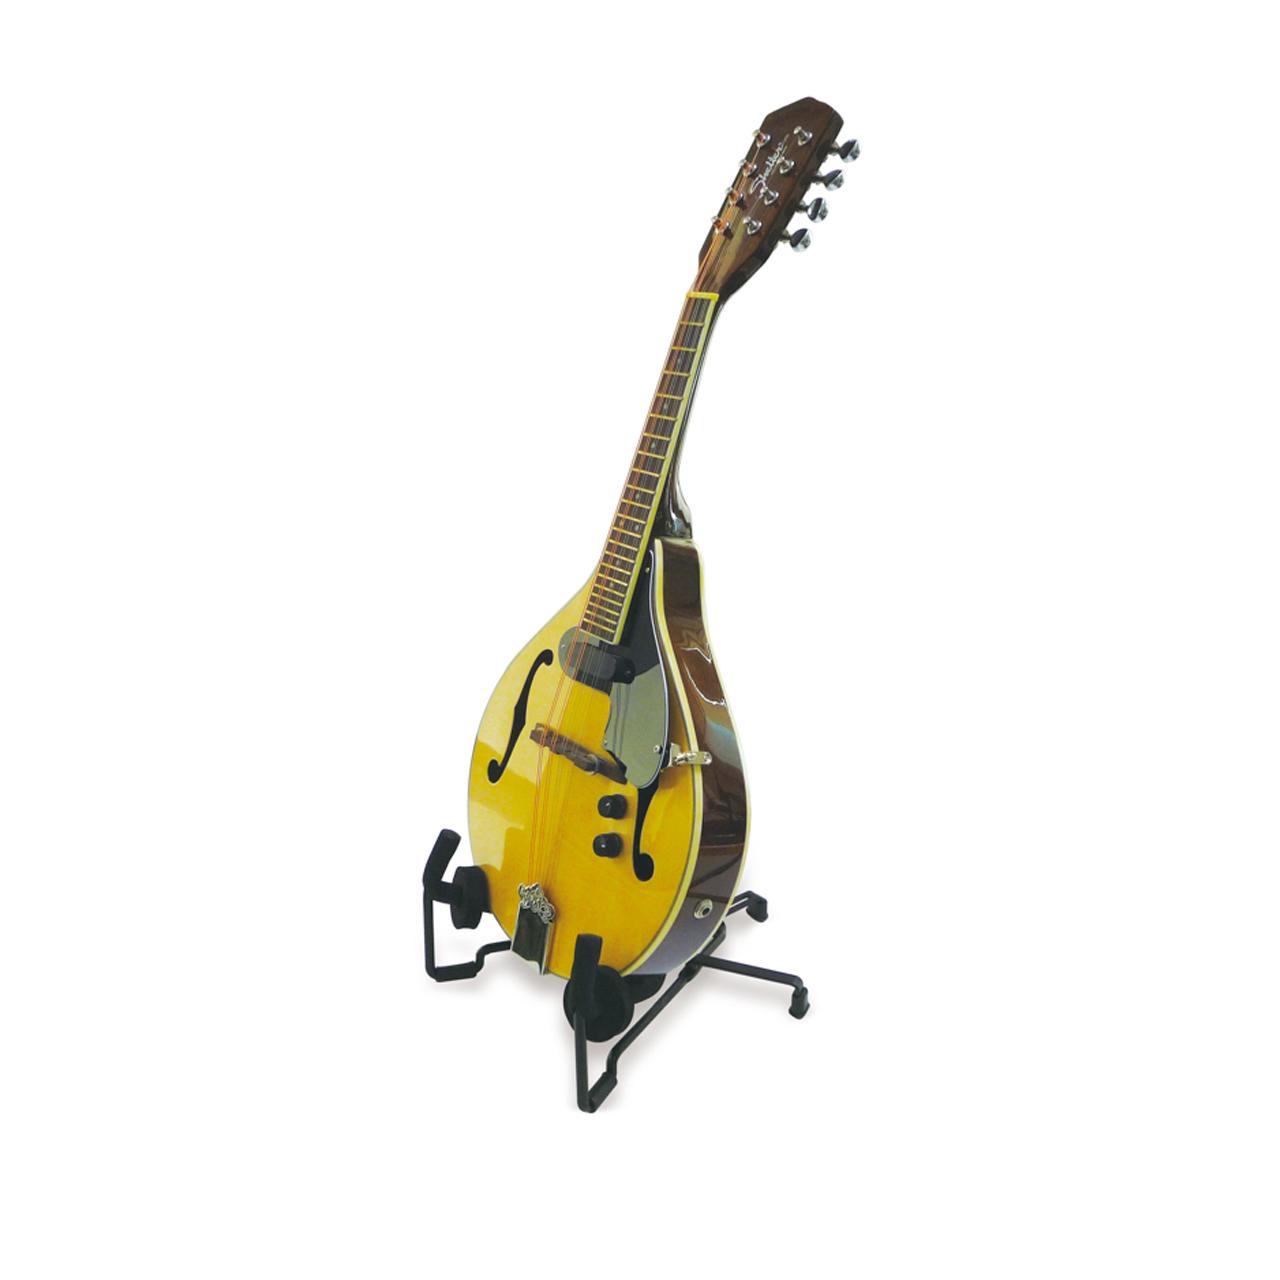 Suporte Travlite P/violao Folk Gs303b Hercules  - Audio Video & cia